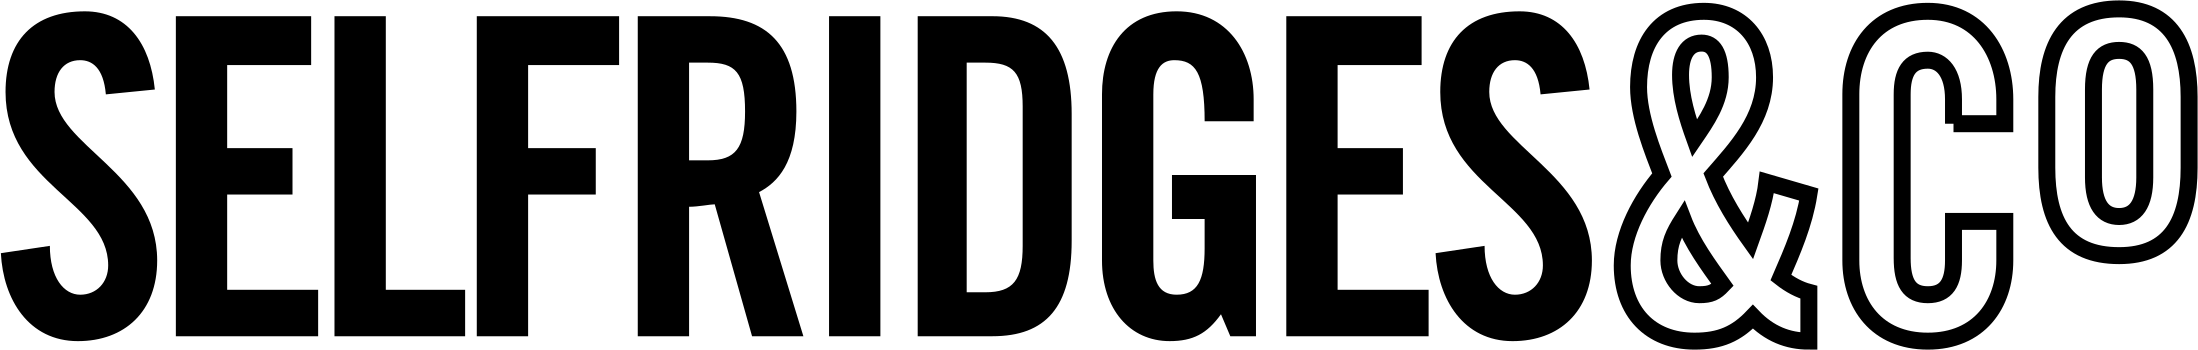 Selfridges brand logo